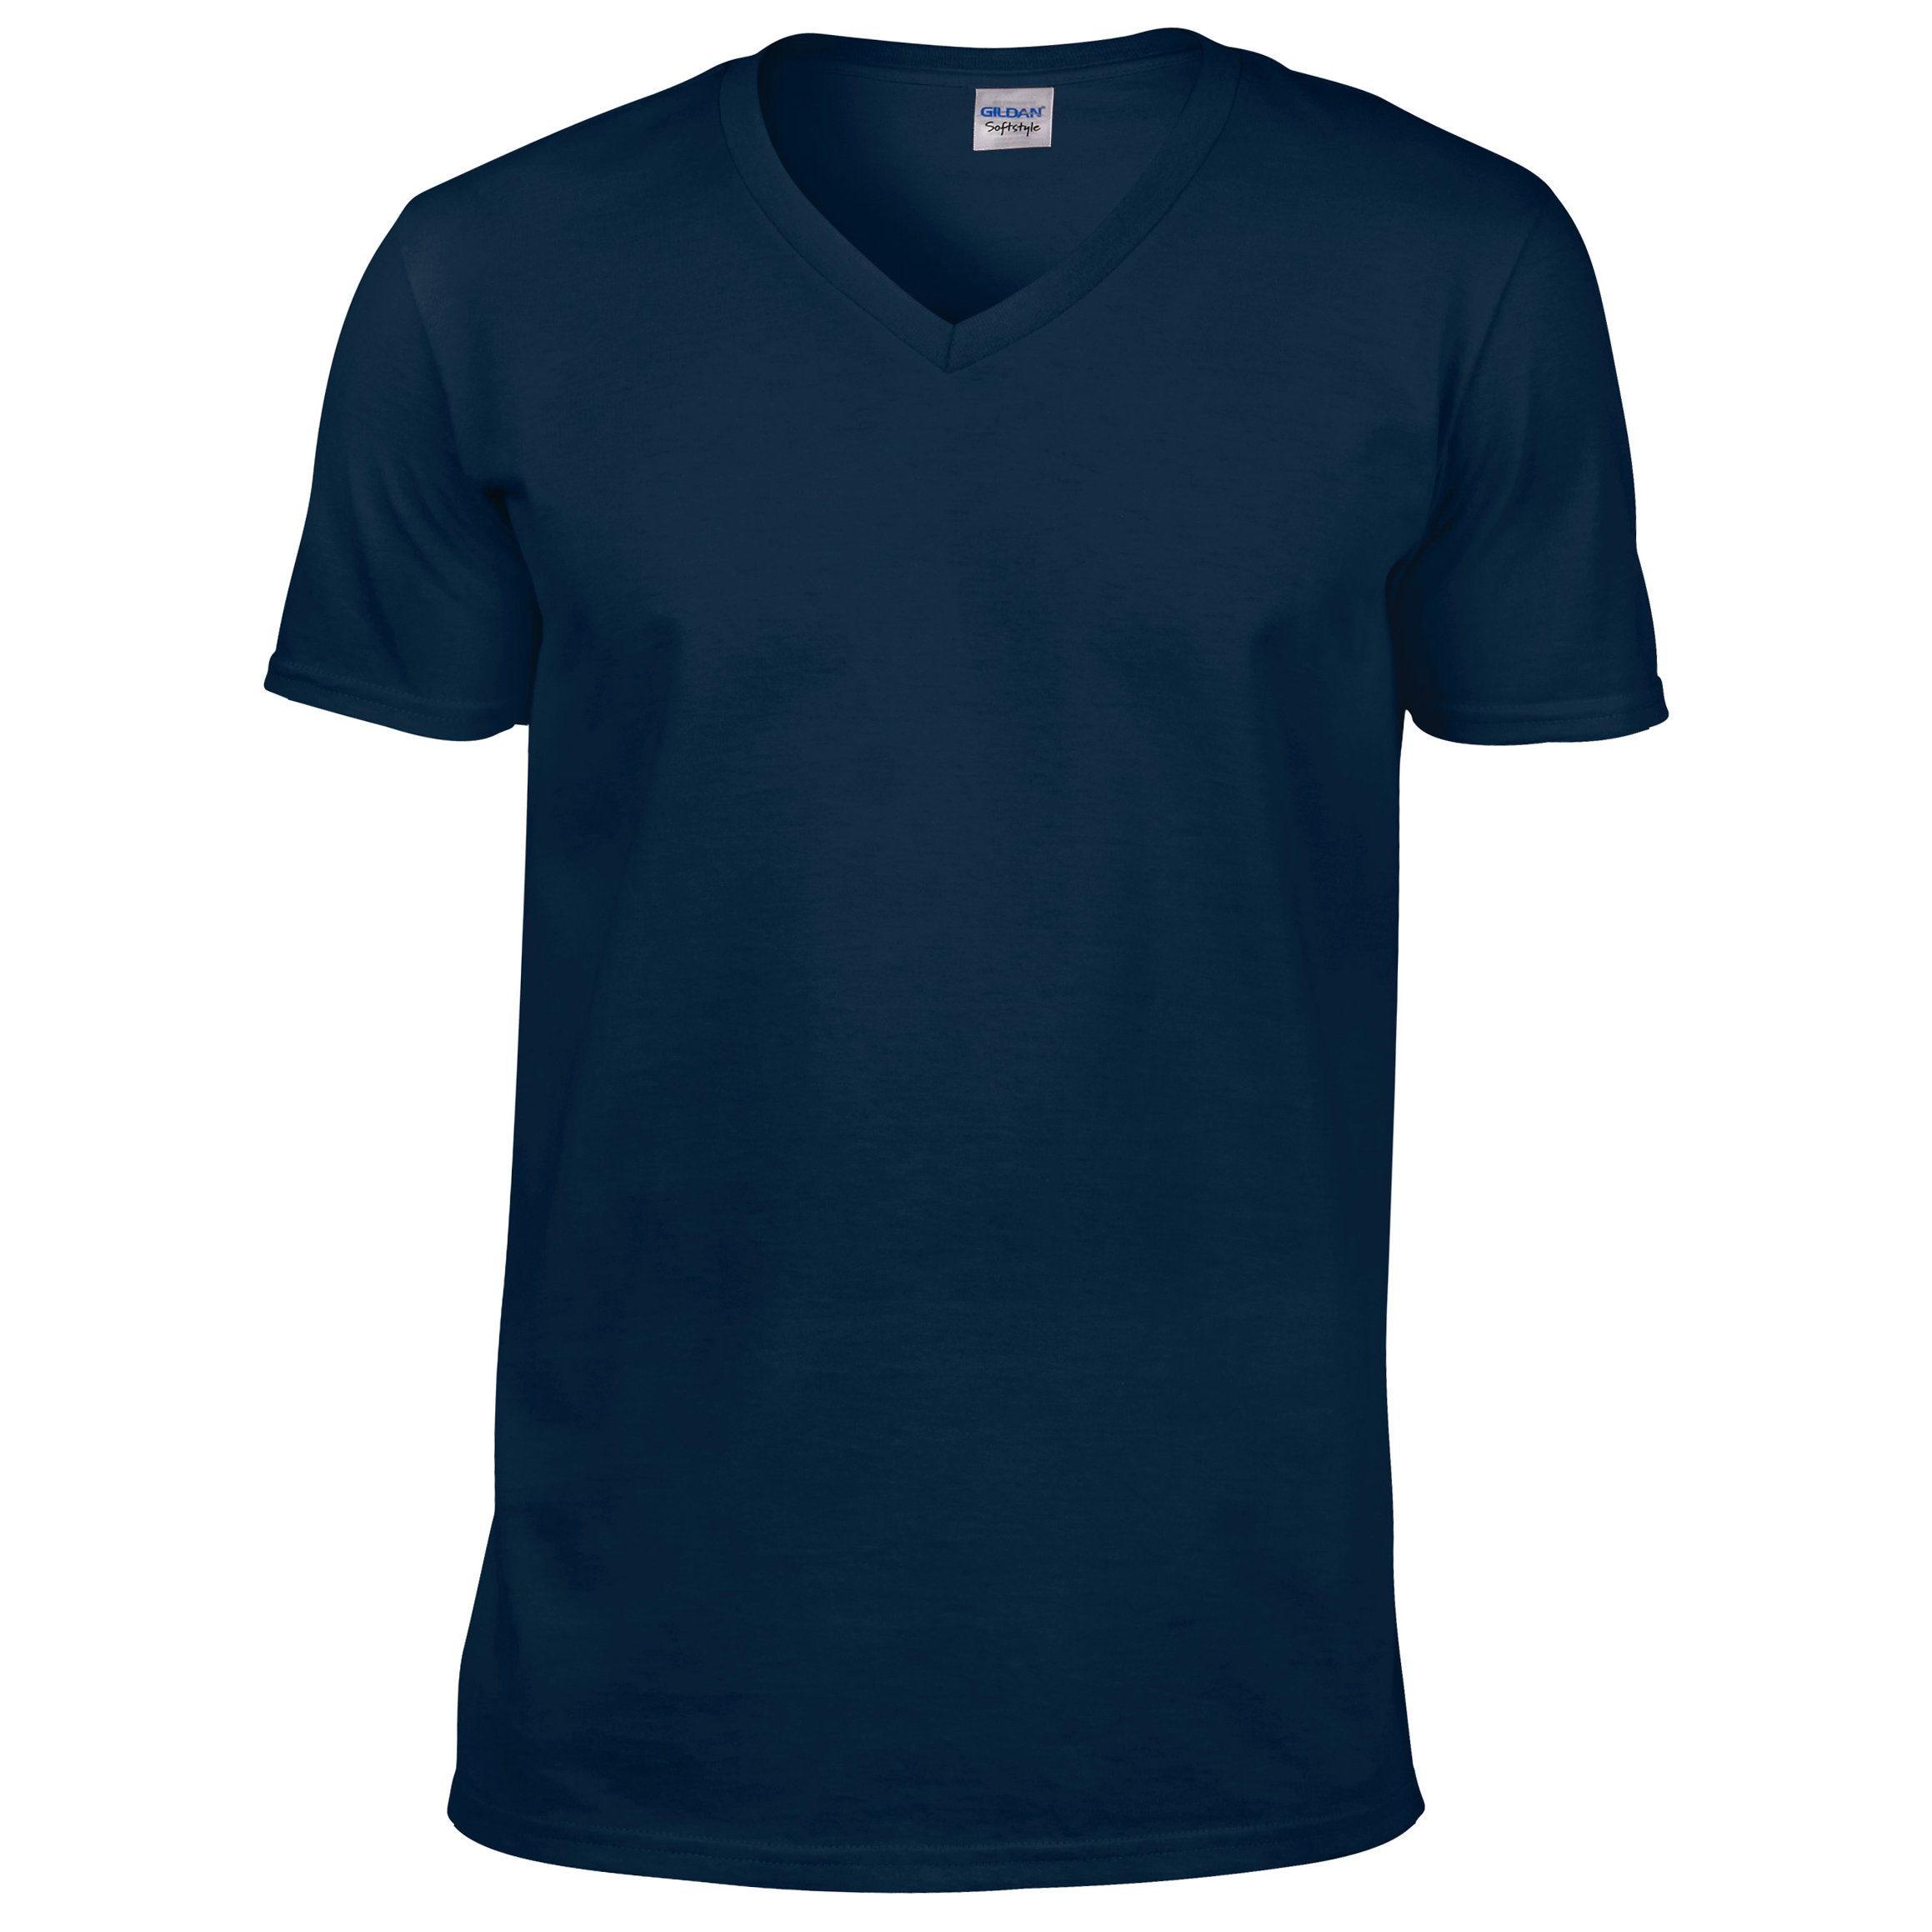 Design your own t-shirt gildan - Gd09 Gildan Premium Cotton V Neck T Shirt